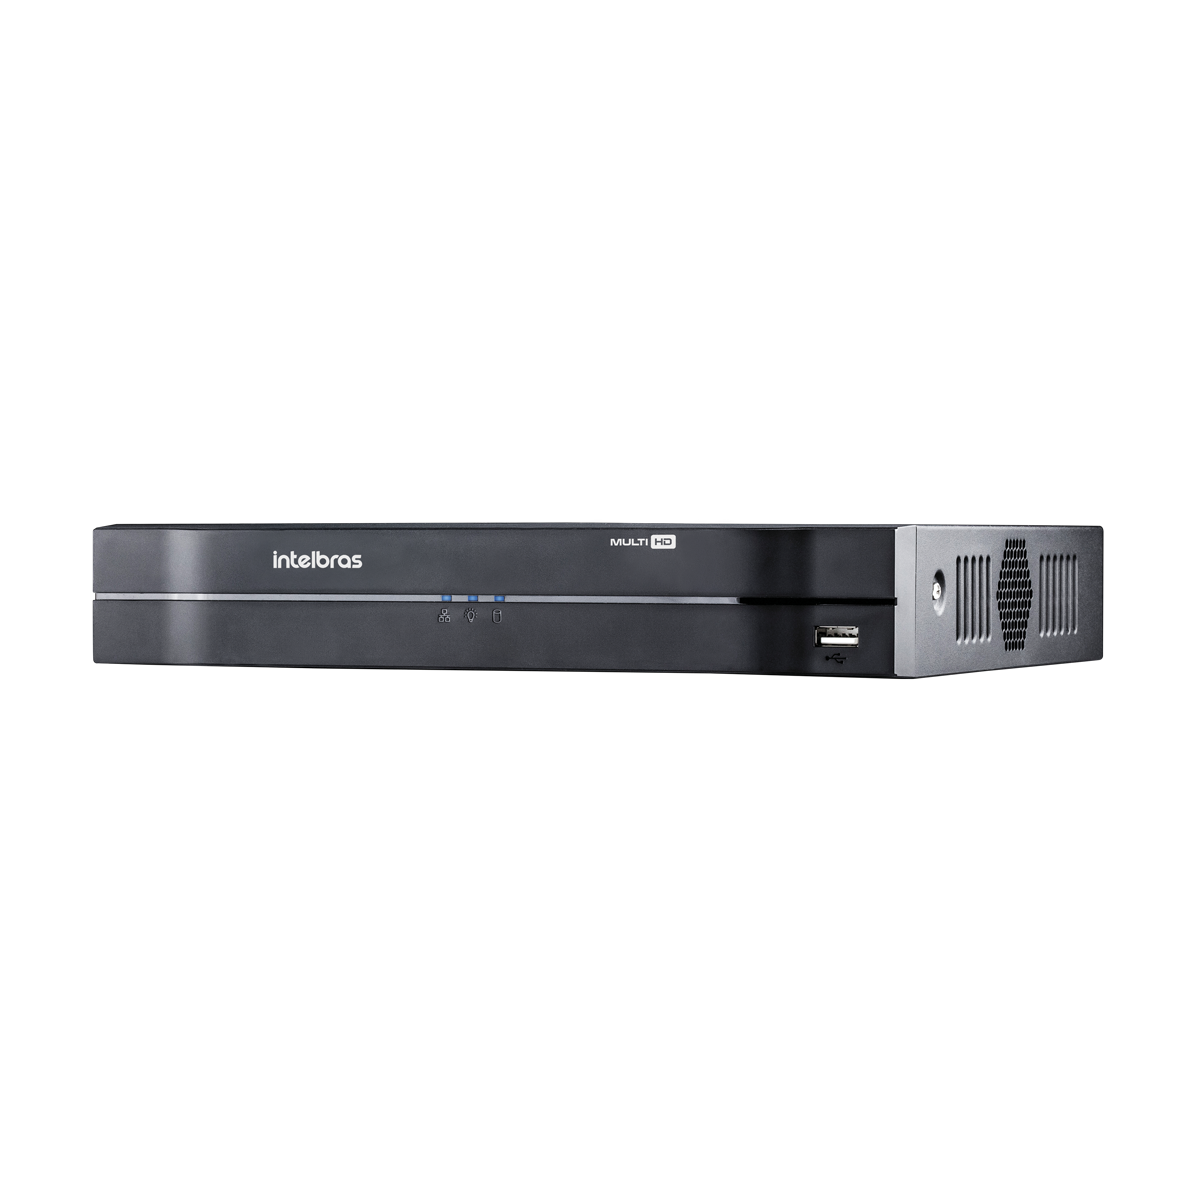 Gravador digital de vídeo 8 canais MHDX 1108